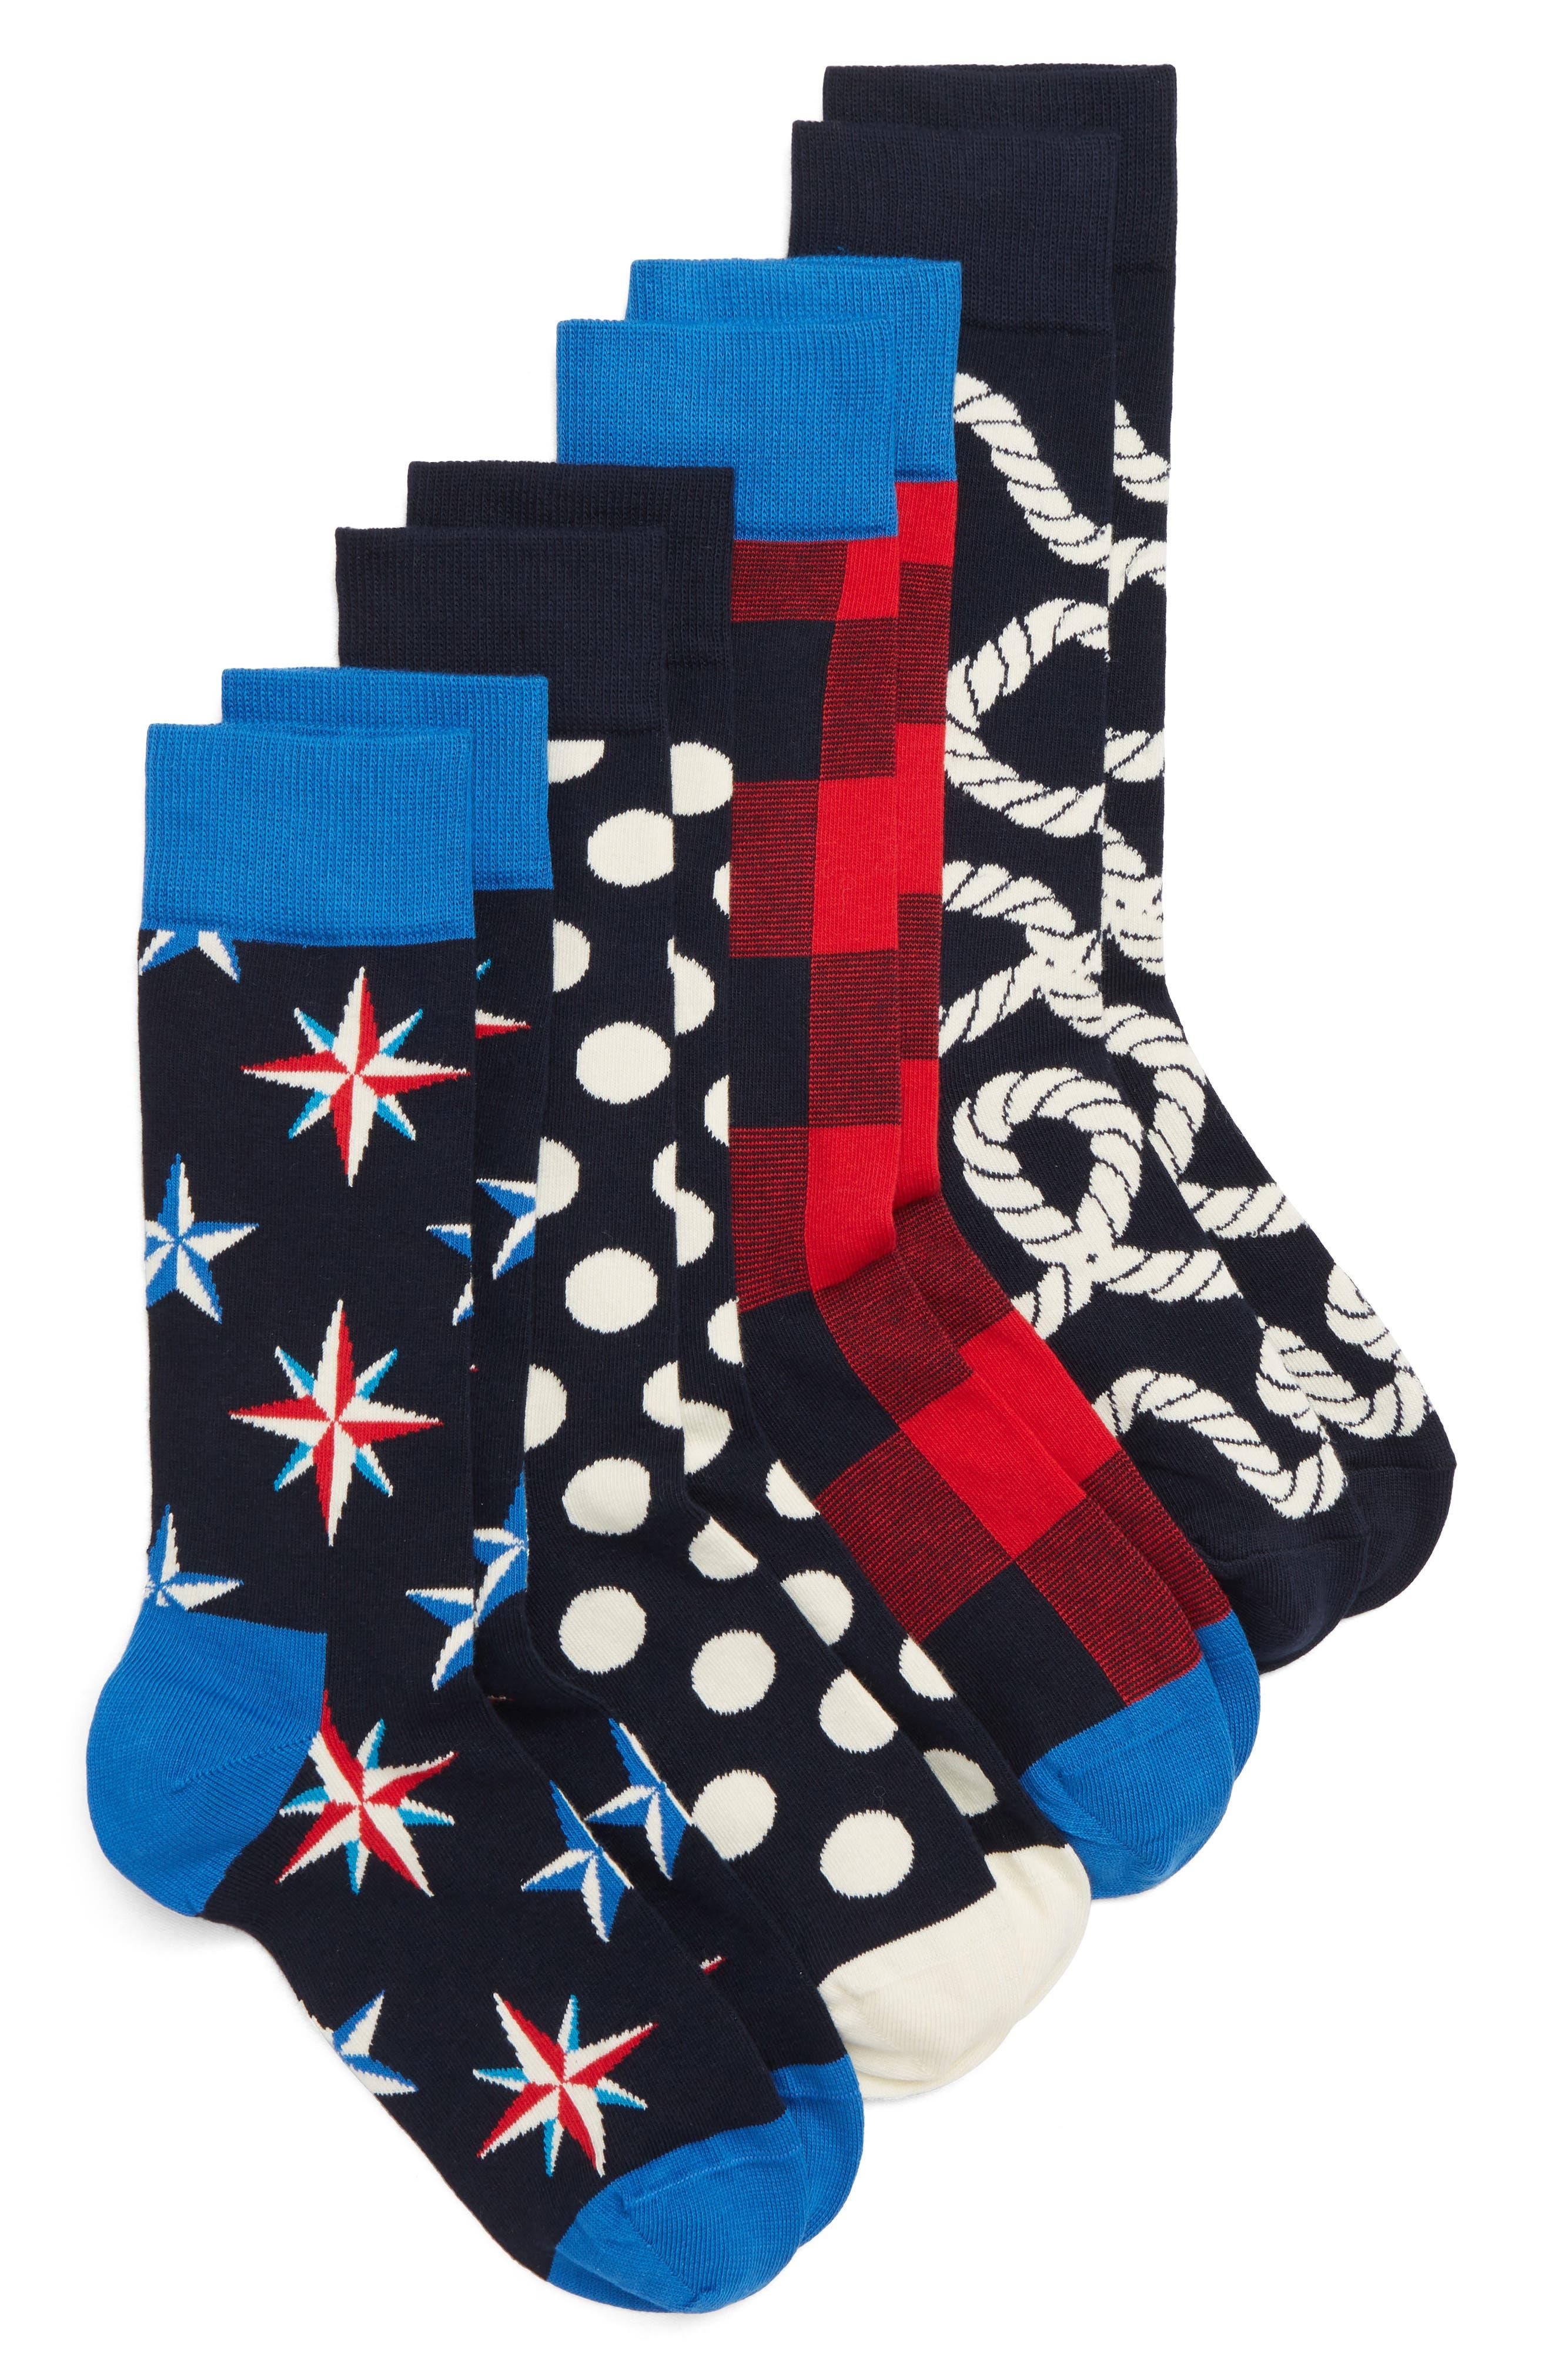 Nautical 4-Pack Box Set Socks,                         Main,                         color, NAVY/ RED/ WHITE